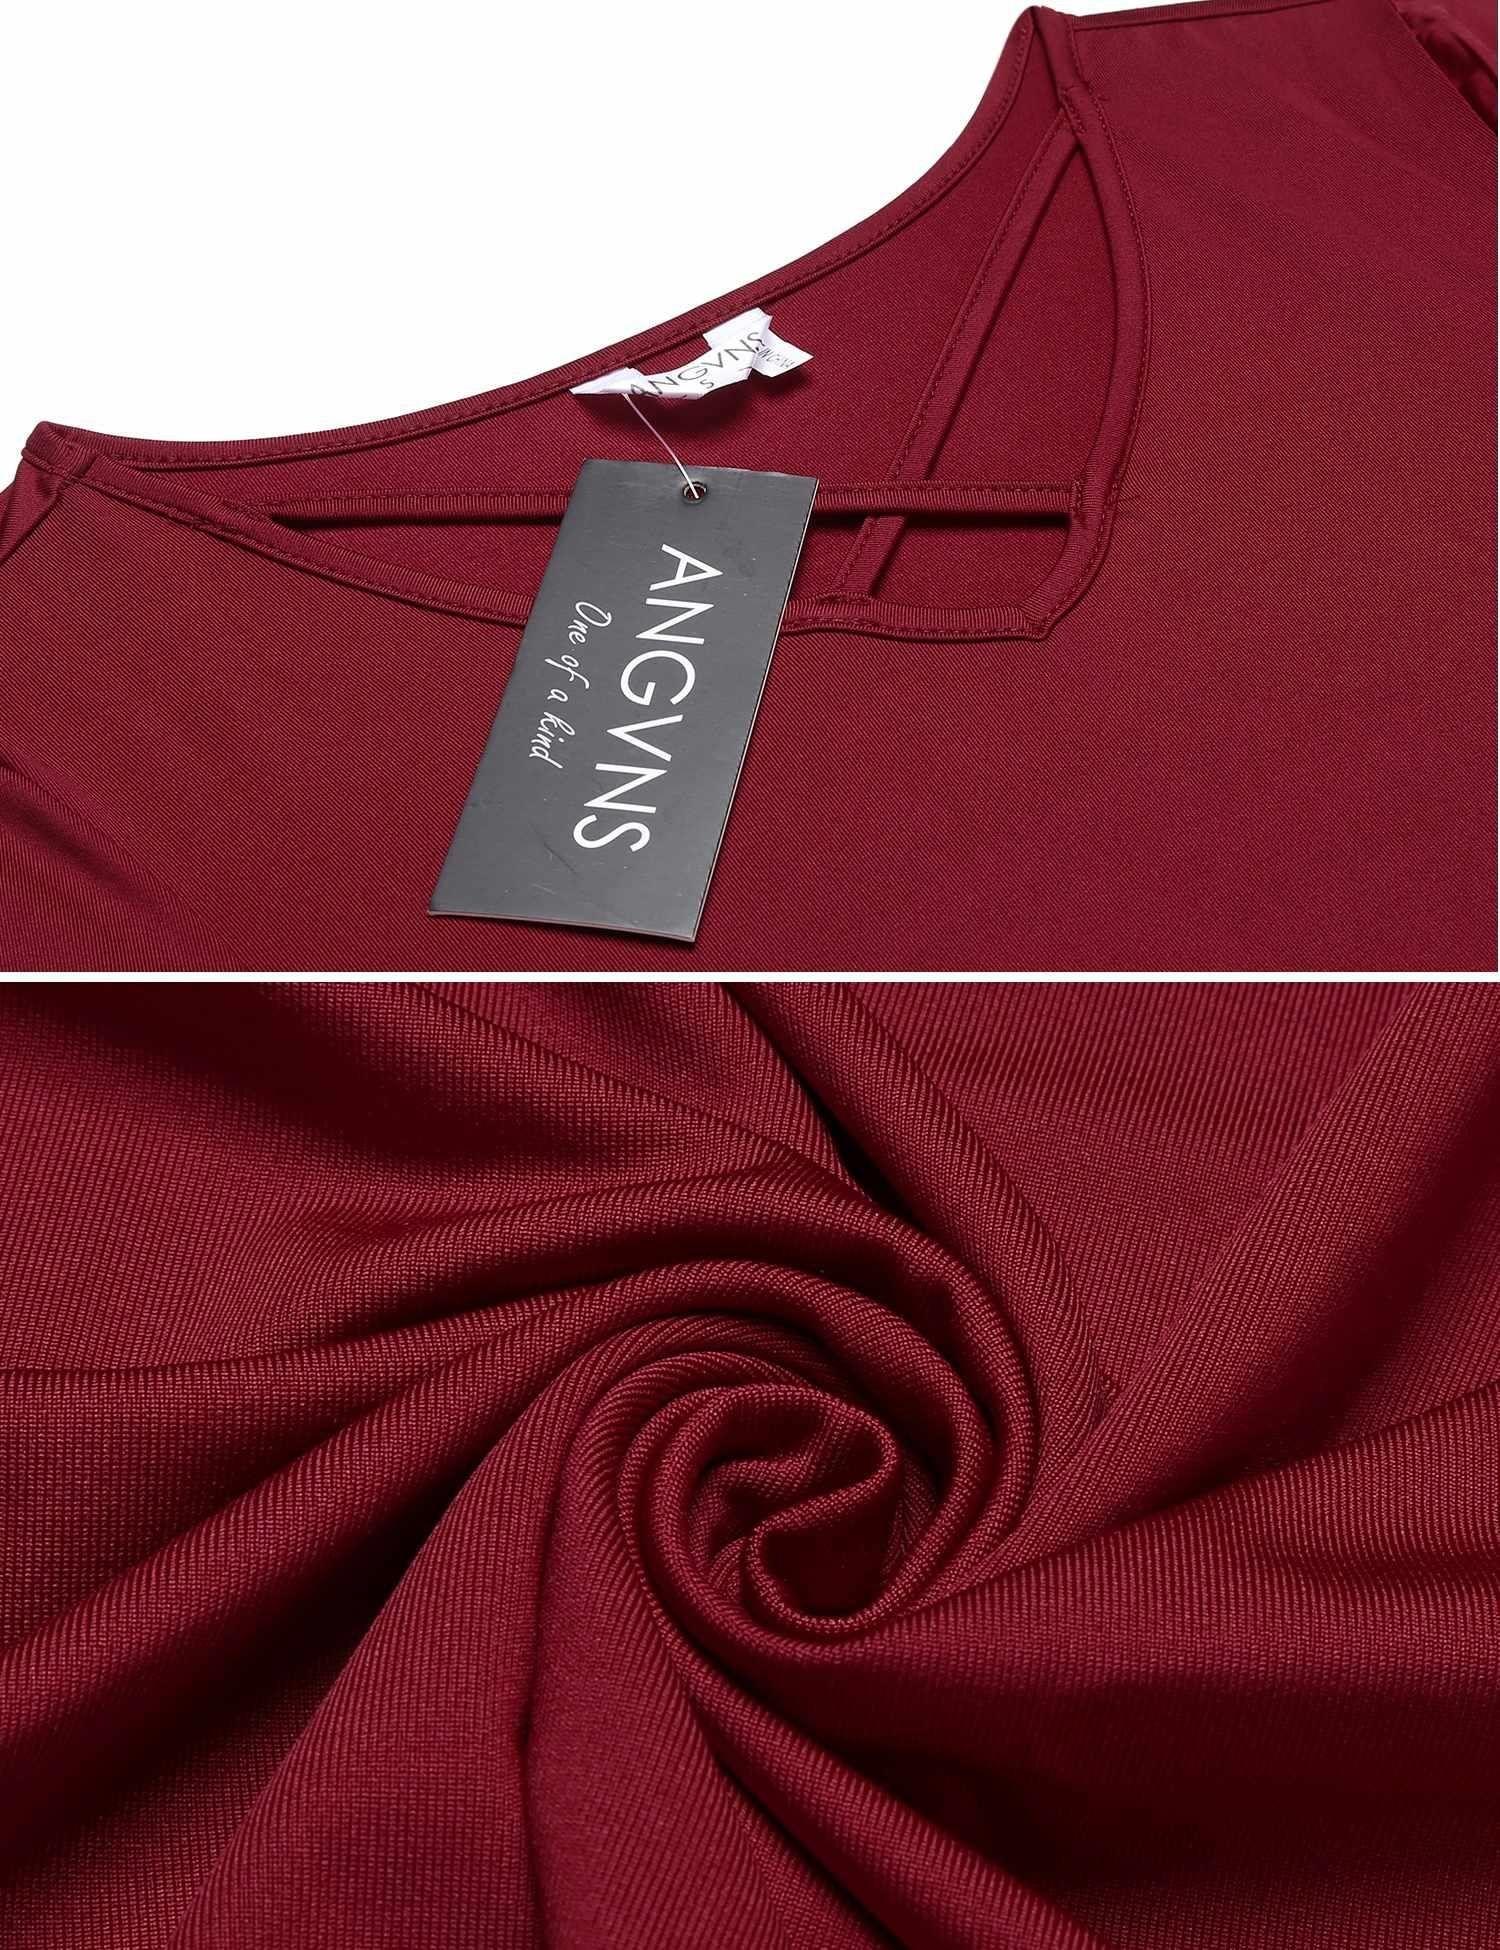 ANGVNS Womens Summer Cross Front V Neck Solid Dress Short Sleeve